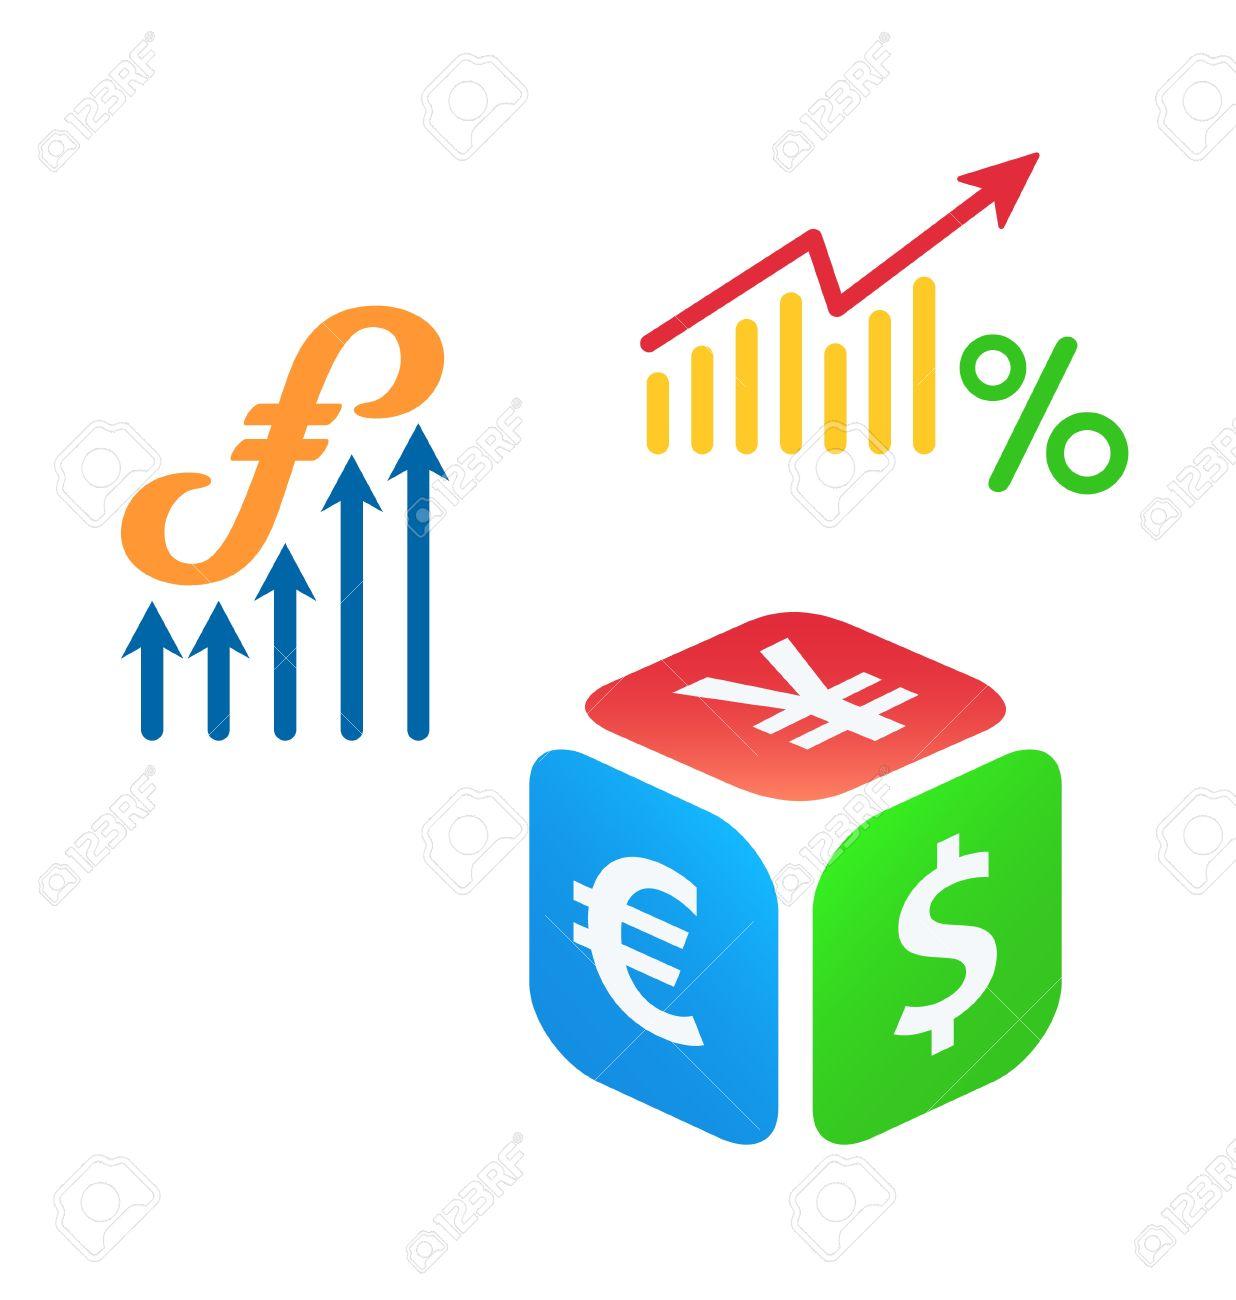 Accounting logo clipart jpg royalty free stock Accountant Cliparts | Free download best Accountant Cliparts on ... jpg royalty free stock